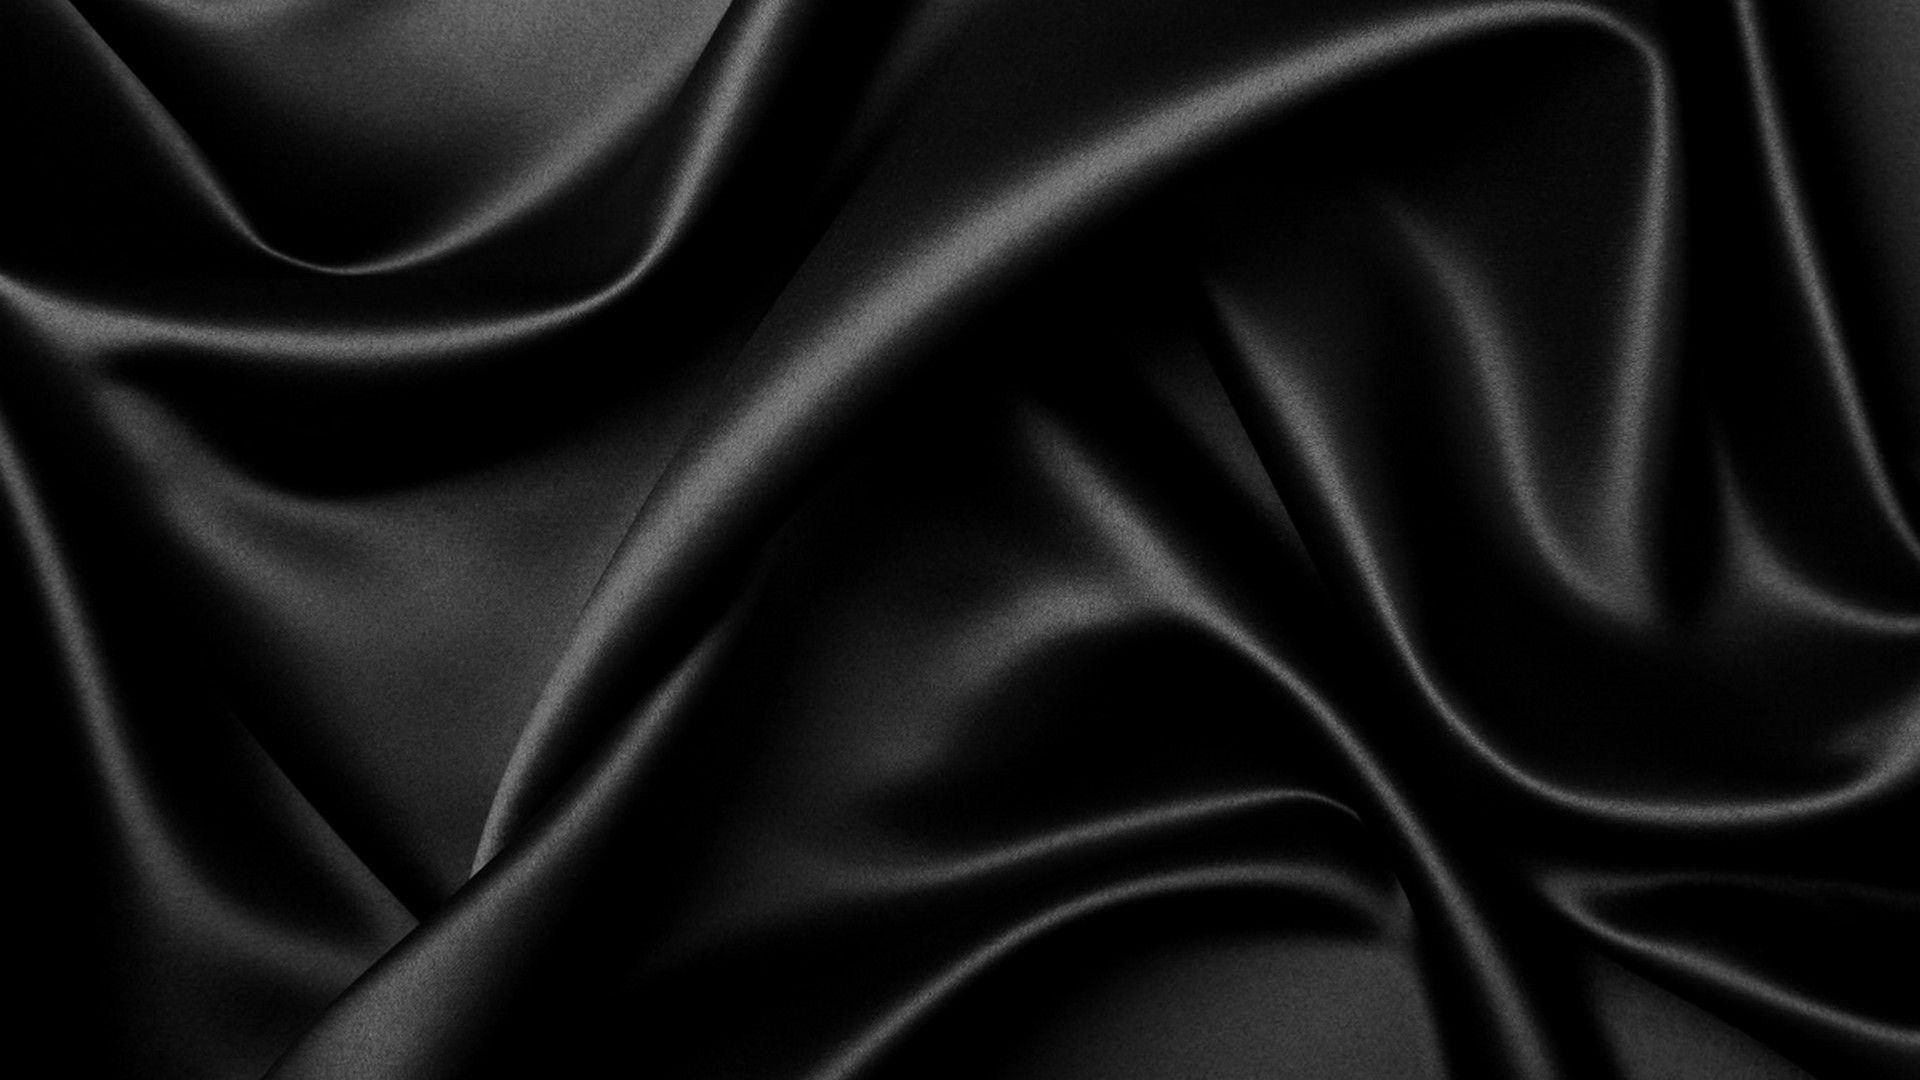 Black Silk Hd Backgrounds 2021 Live Wallpaper Hd Black Silk Fabric Photography Black